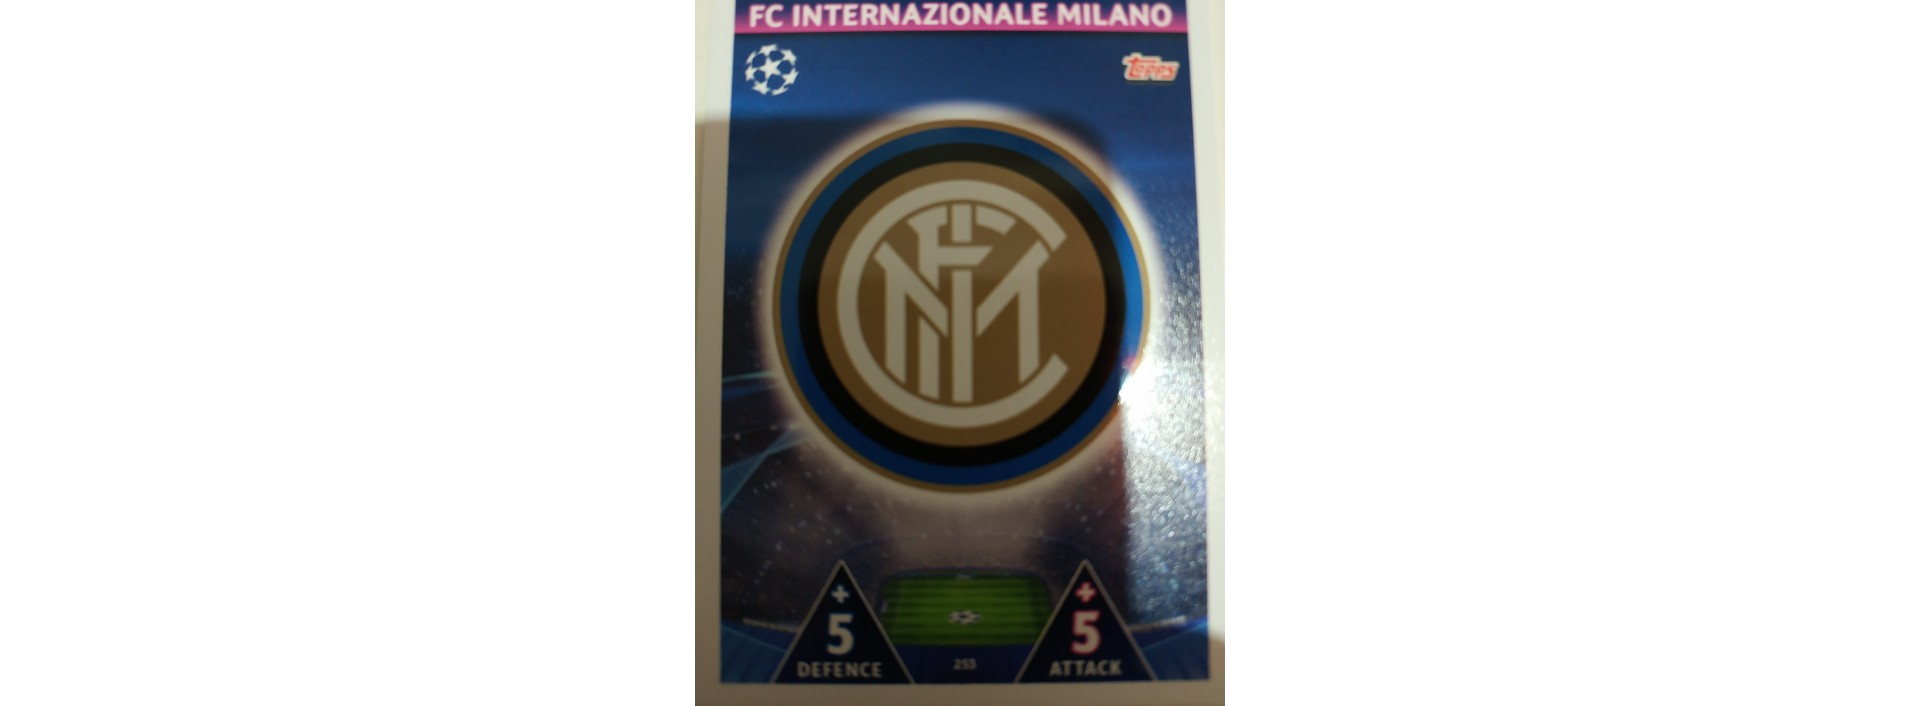 F.C. INTER DE MILAN